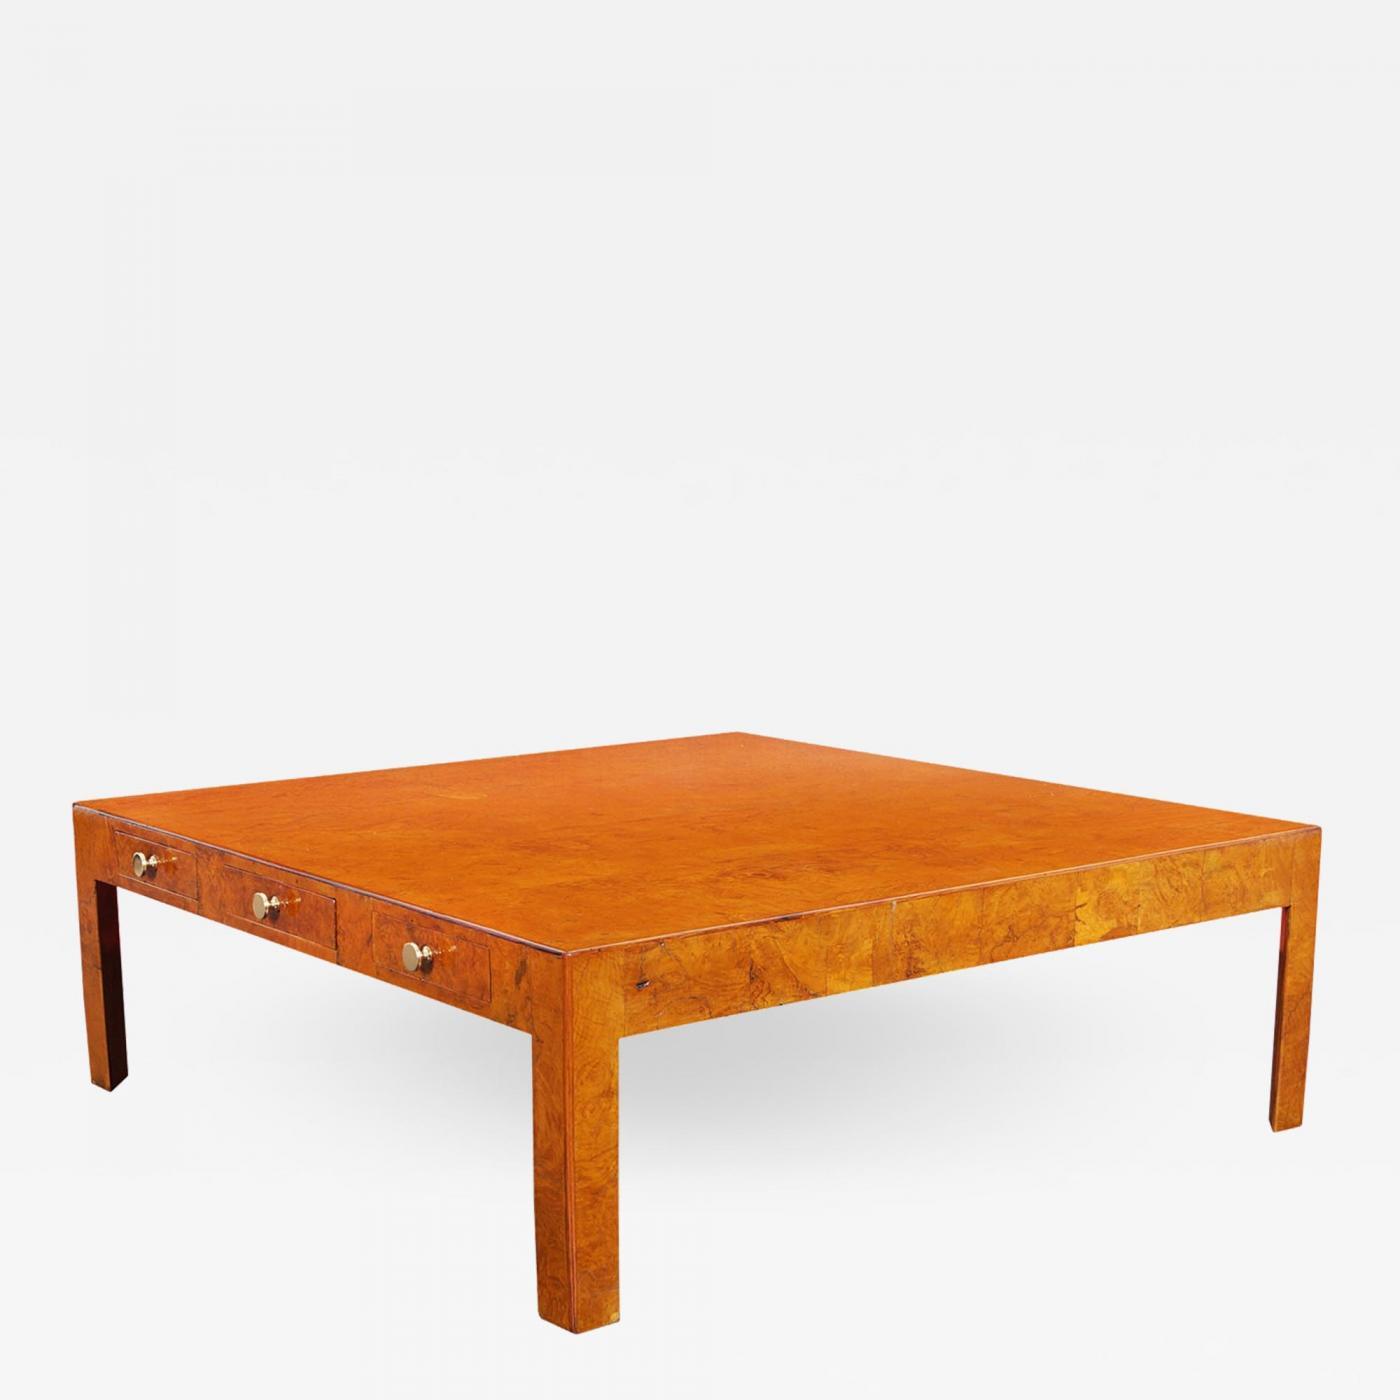 italian wood furniture. Listings / Furniture Tables Coffee · Cannell Chaffin Vintage Italian Burl Wood